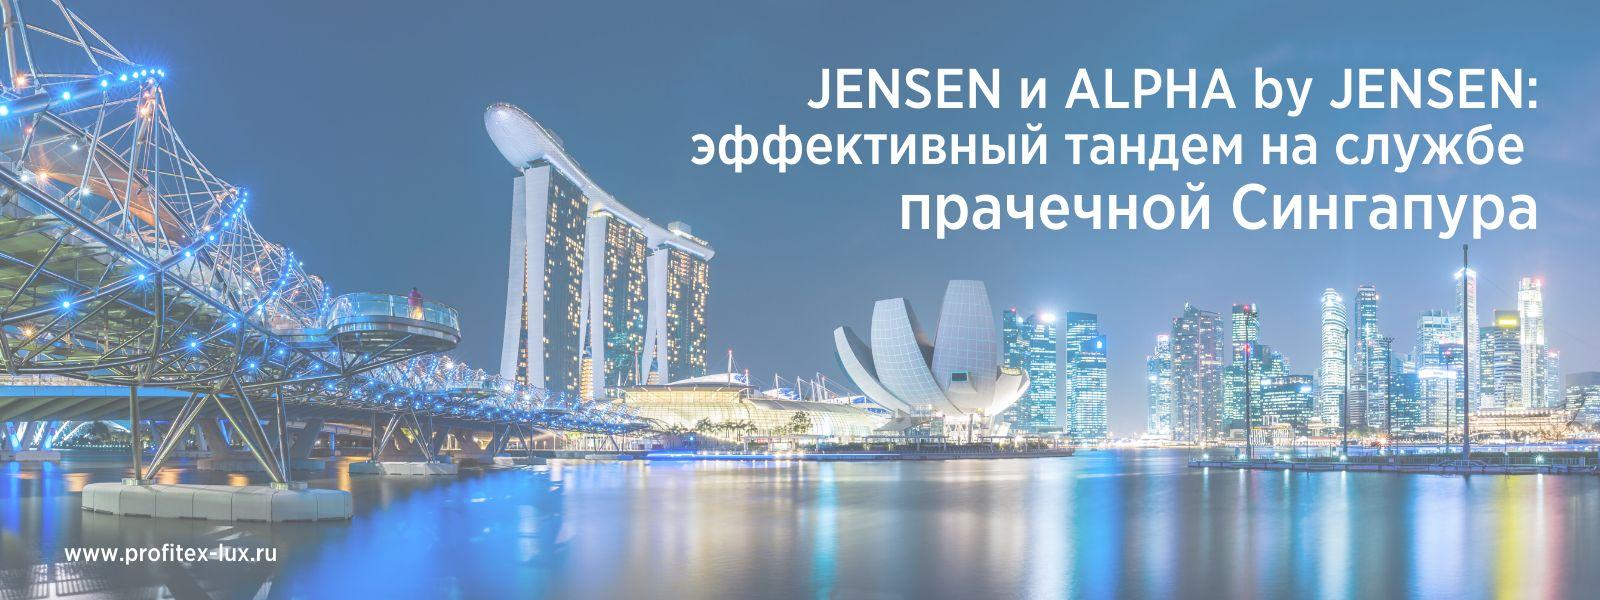 Jensen_в_Сингапуре